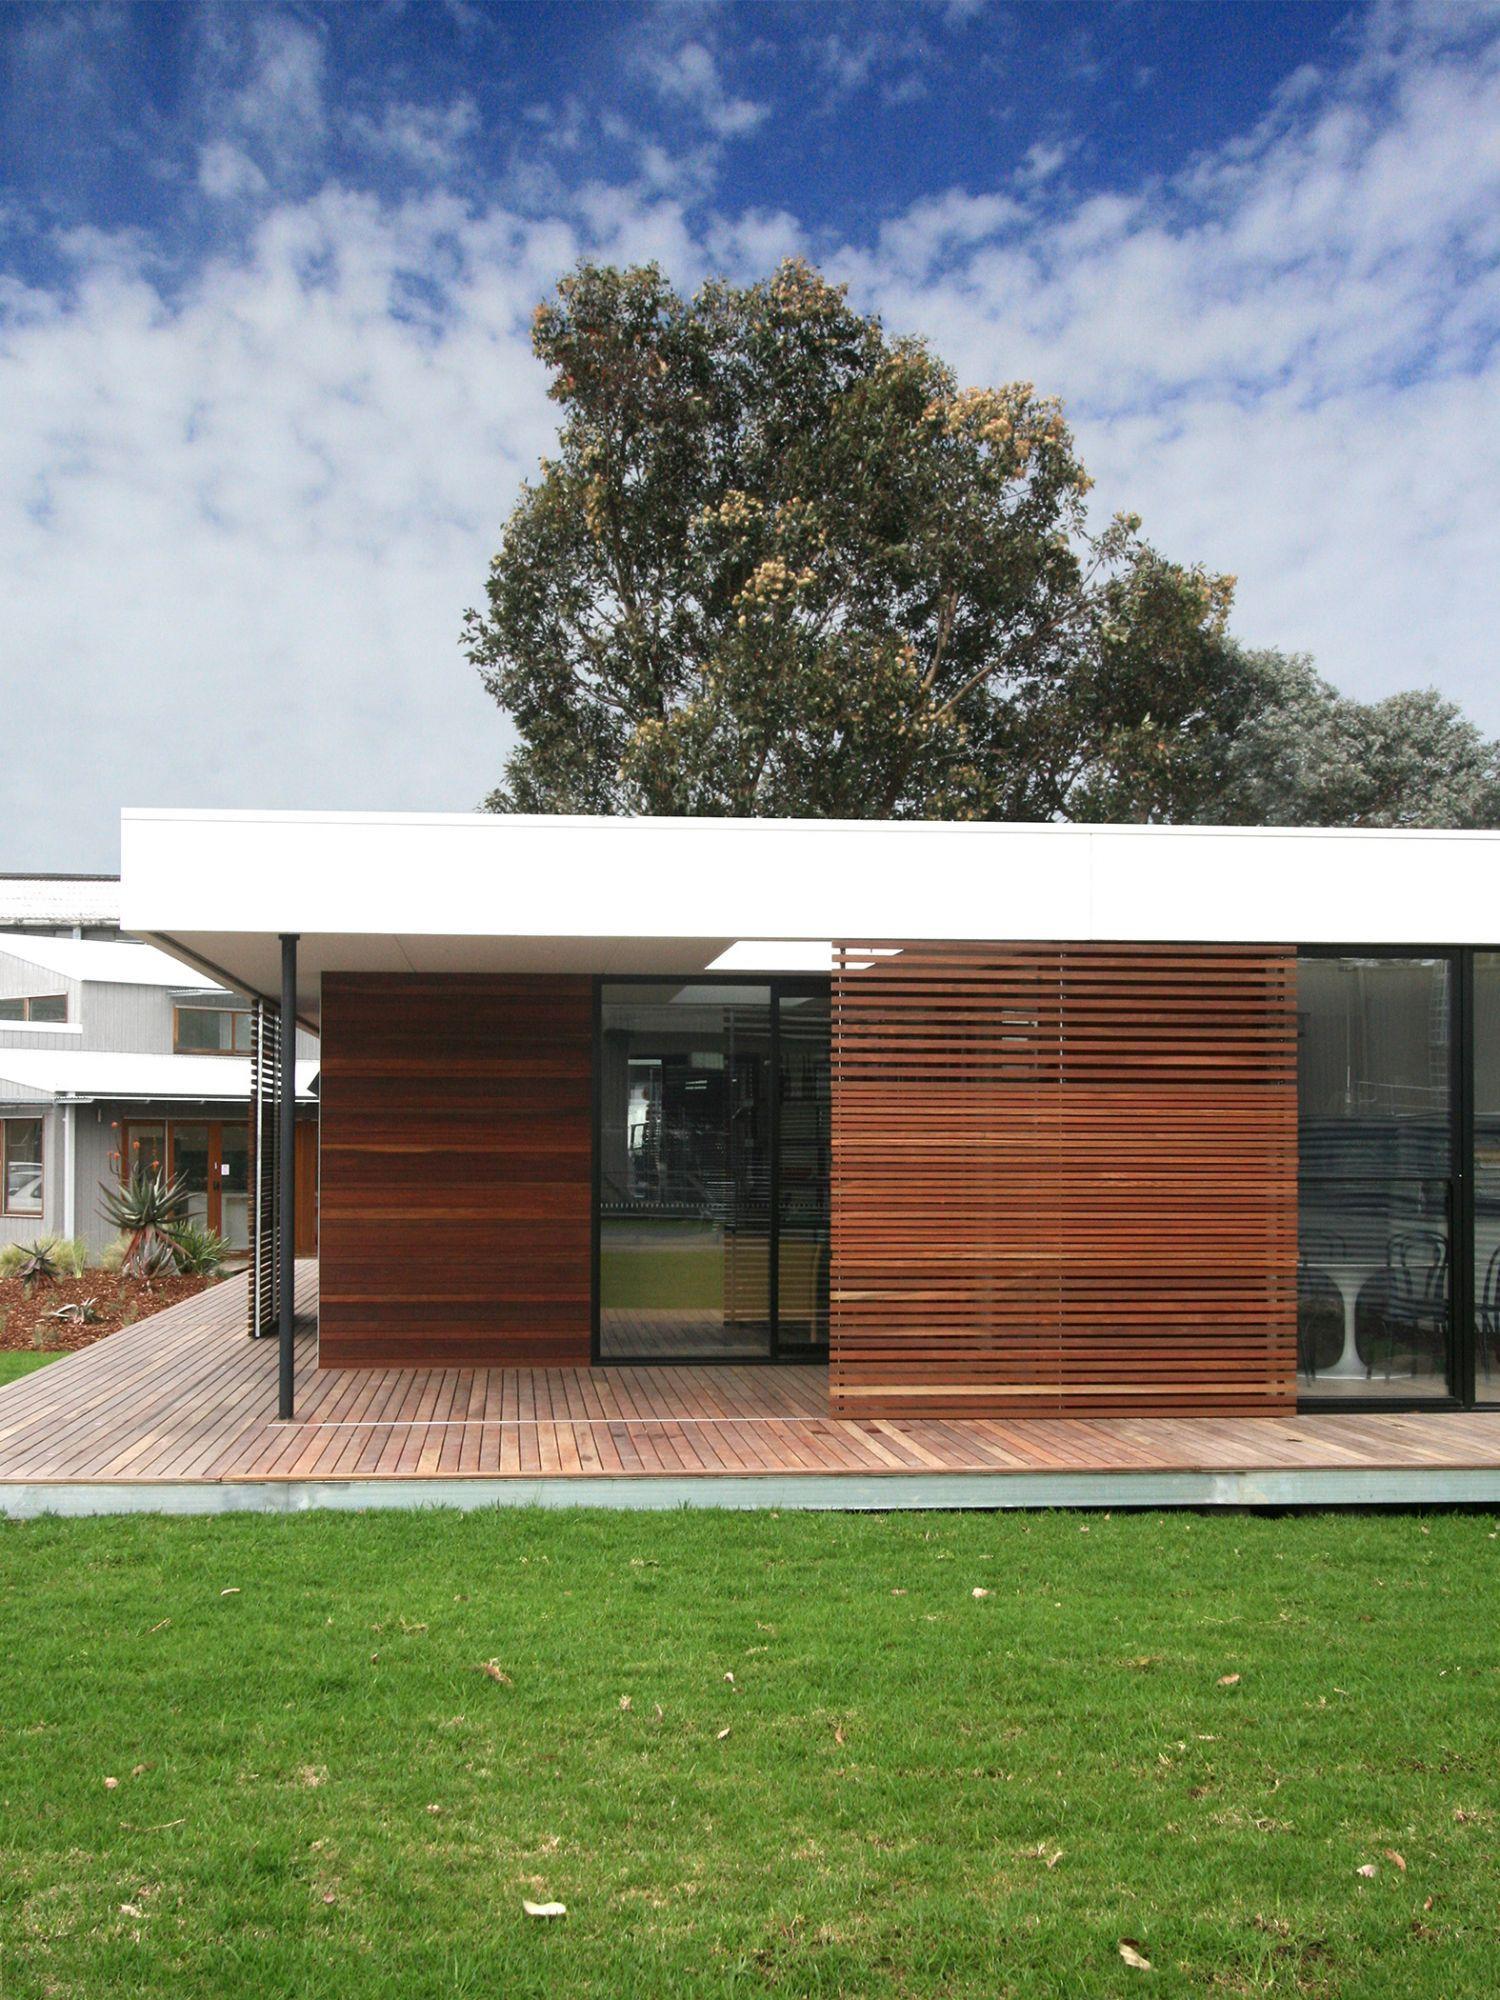 Prebuilt - Eve House on Display